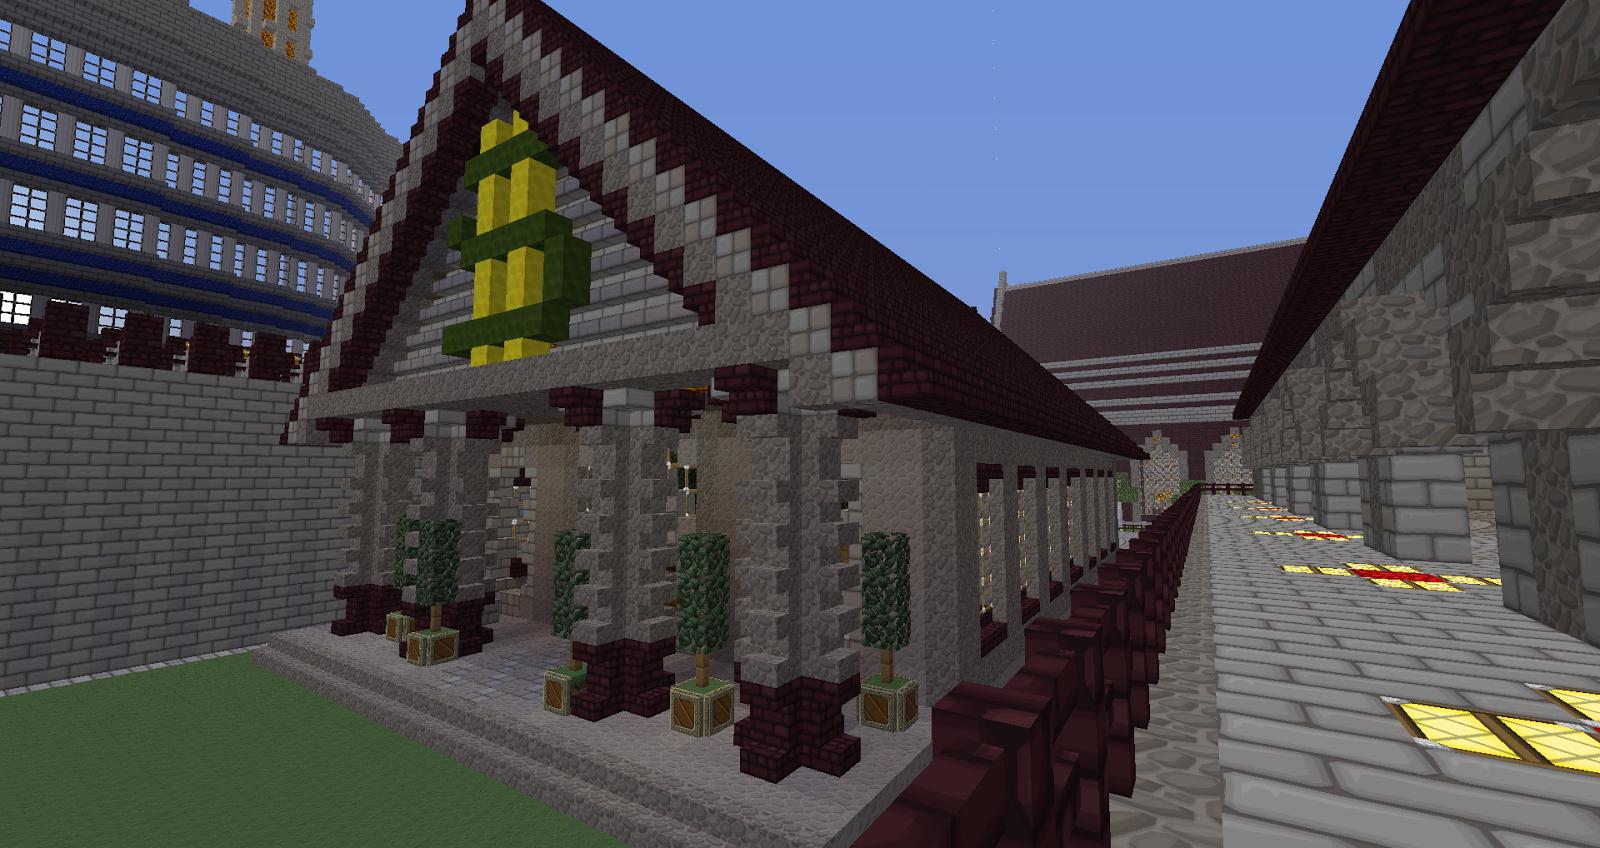 Minecraft Building Ideas: Server Bank